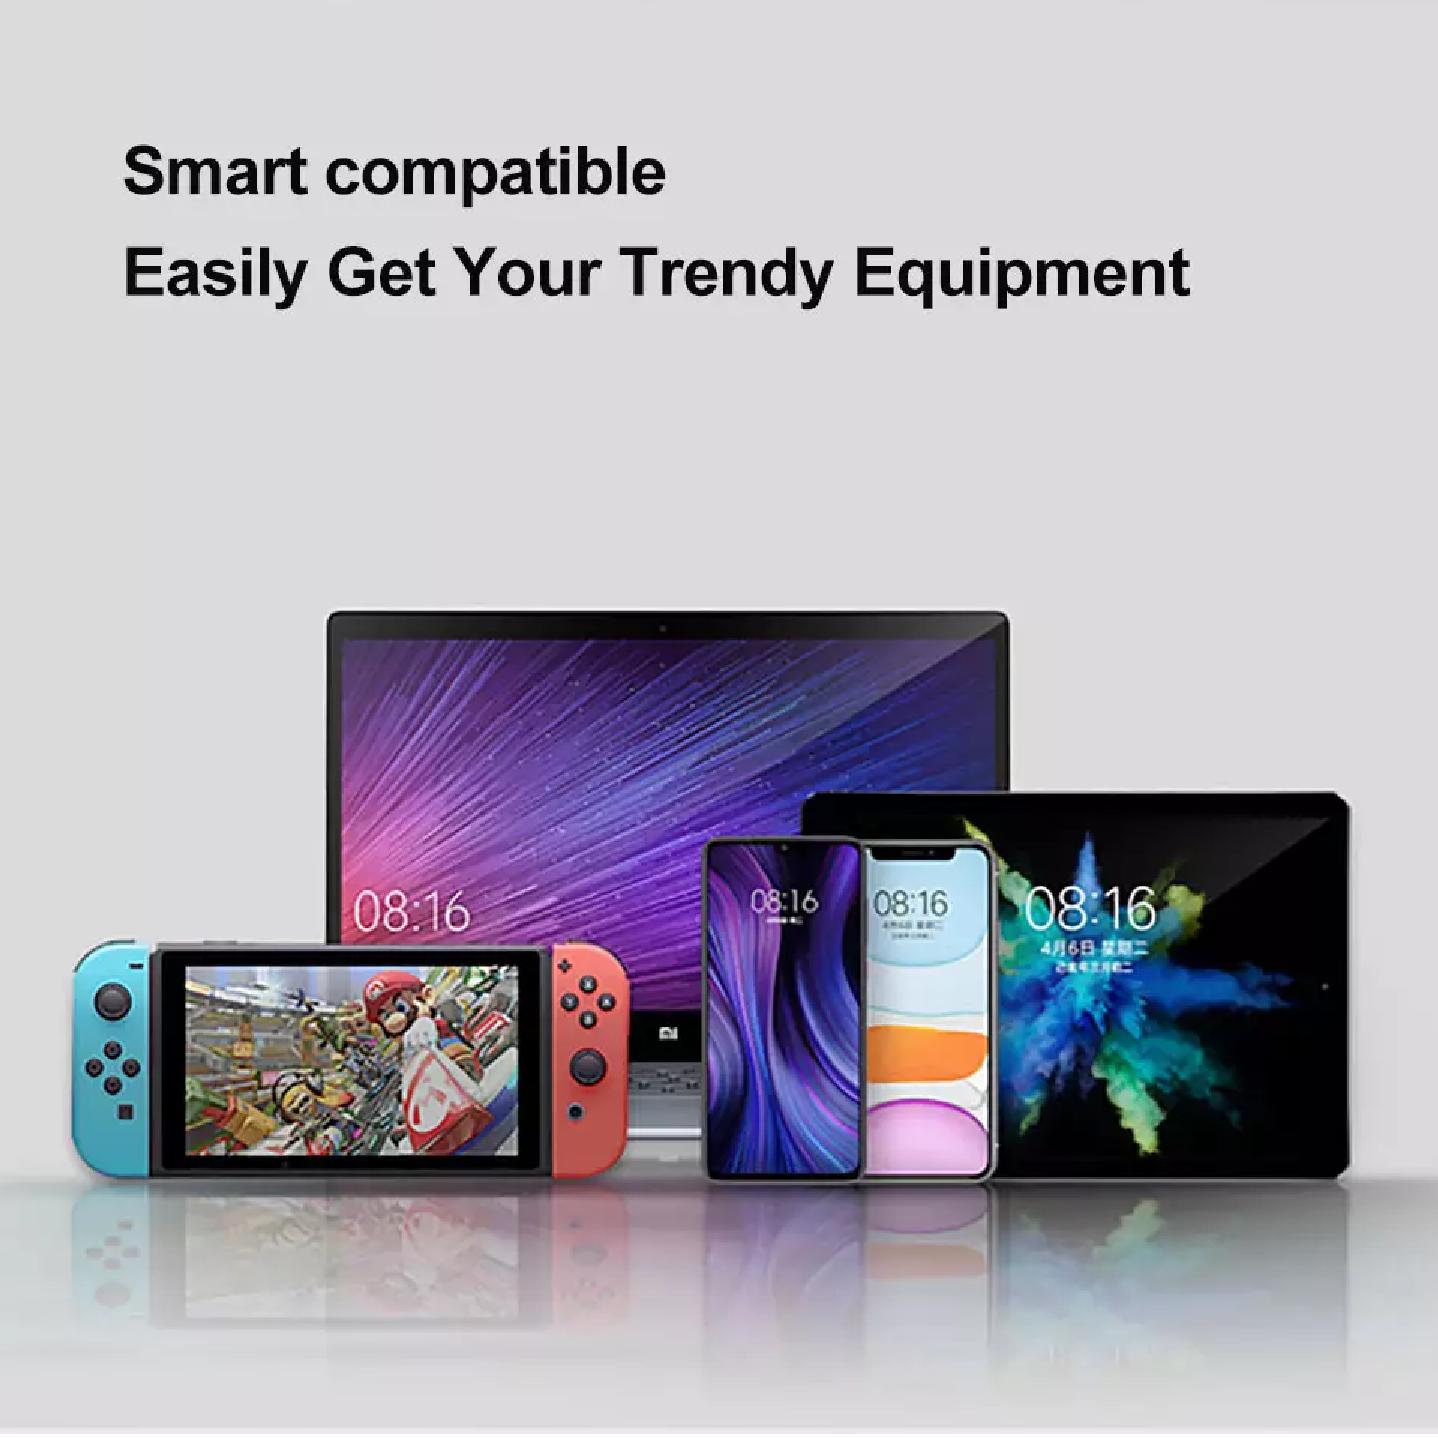 【2021 NEW】READY STOCK !! Xiaomi GaN 65W USB C Wall Charger ...